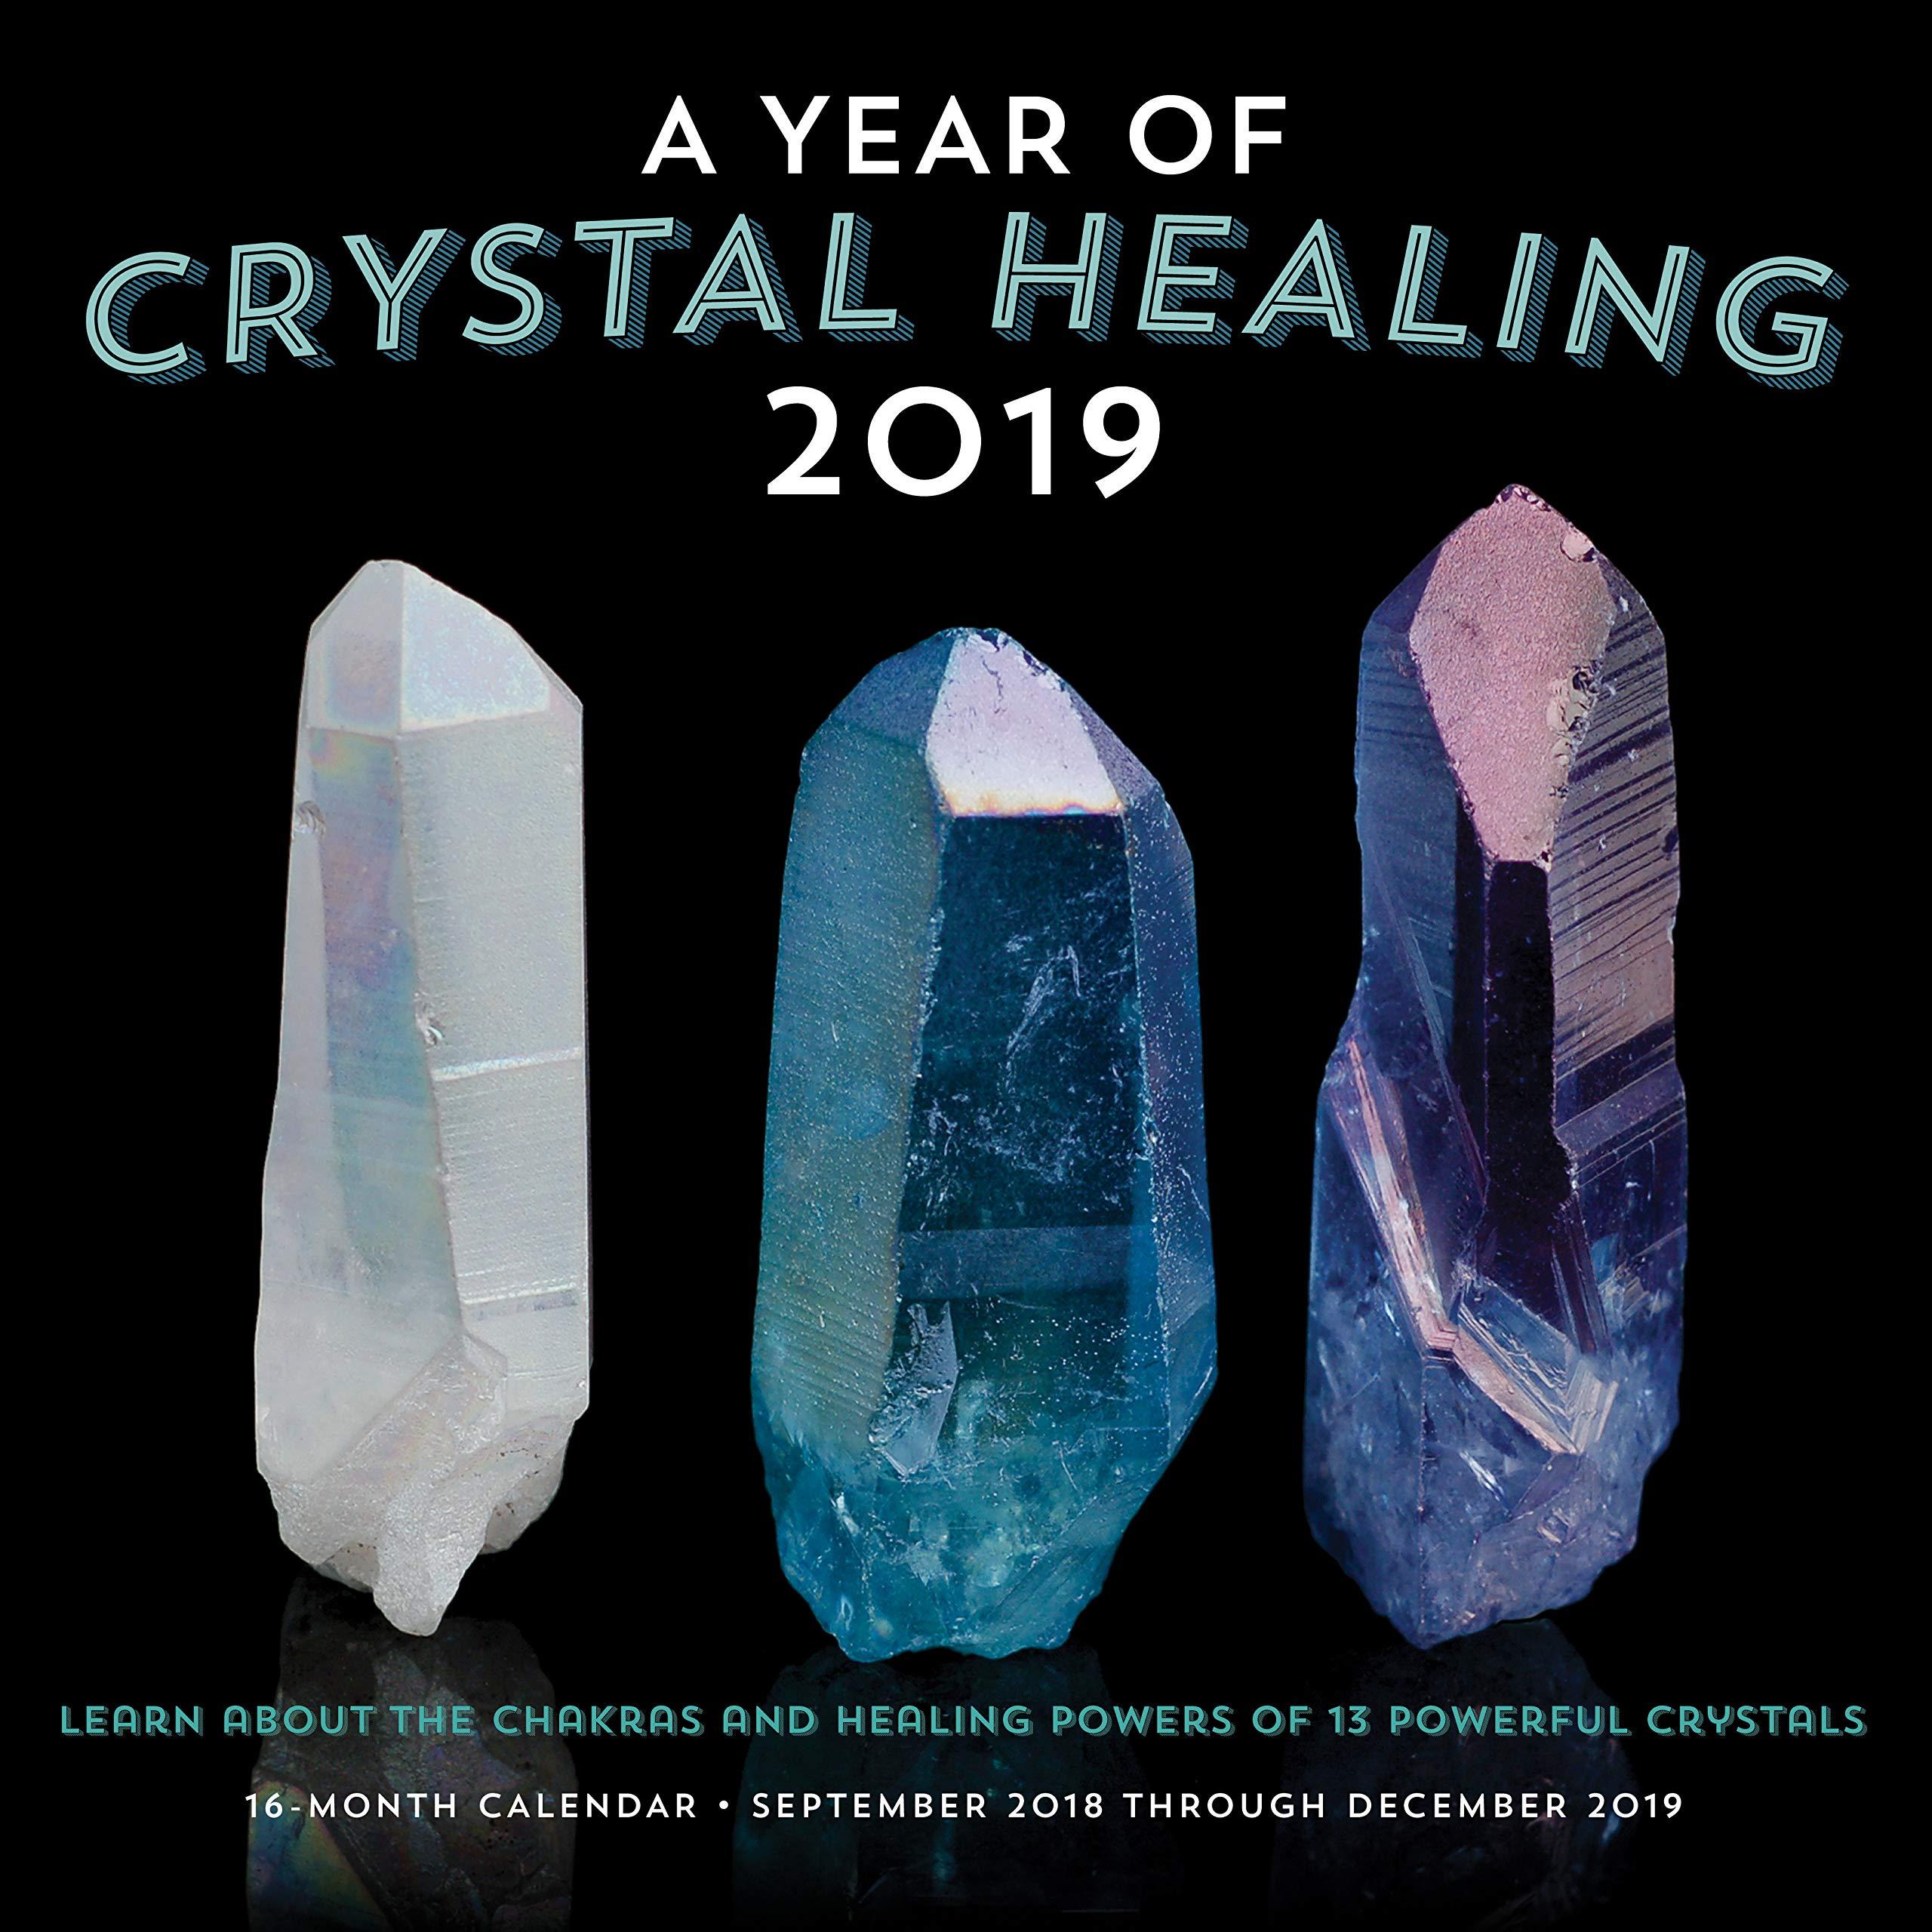 A Year of Crystal Healing 2019: 16-Month Calendar - September 2018